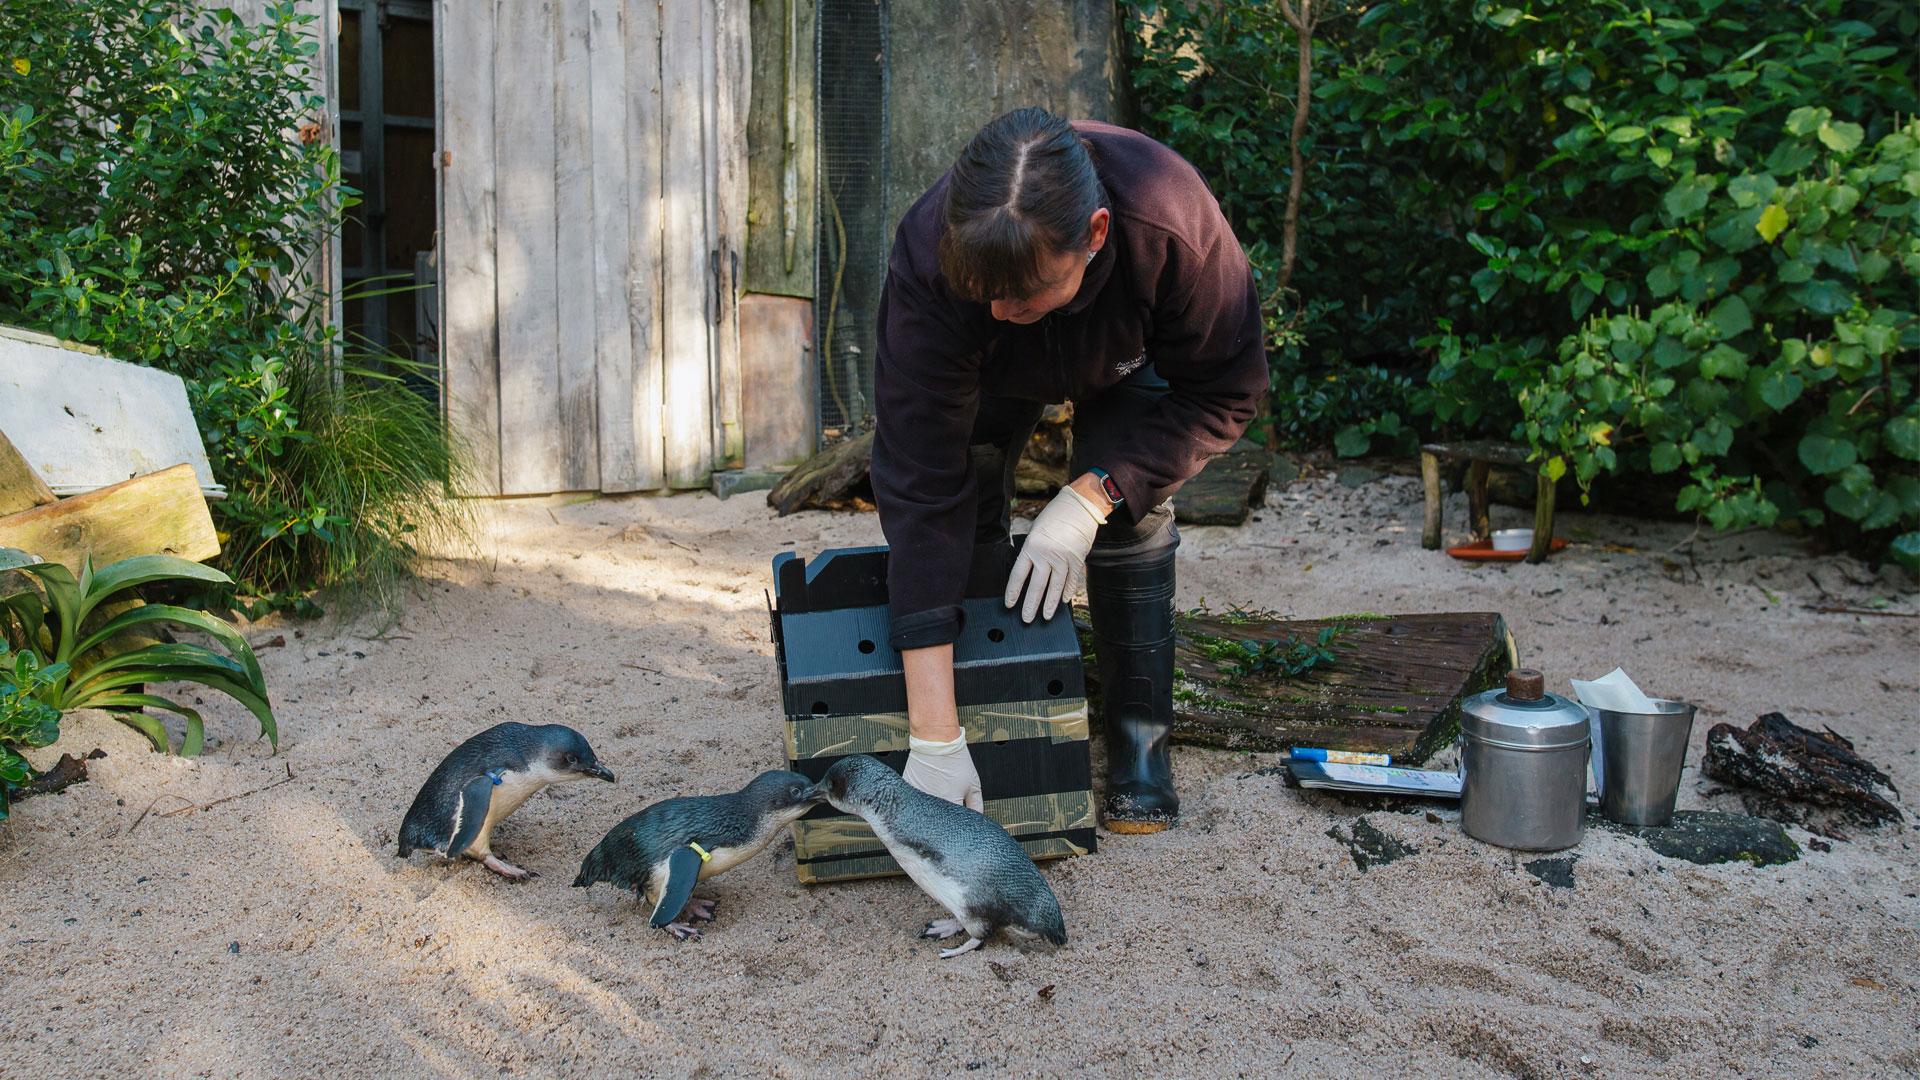 https://rfacdn.nz/zoo/assets/media/little-penguin-paku-gallery-7.jpg